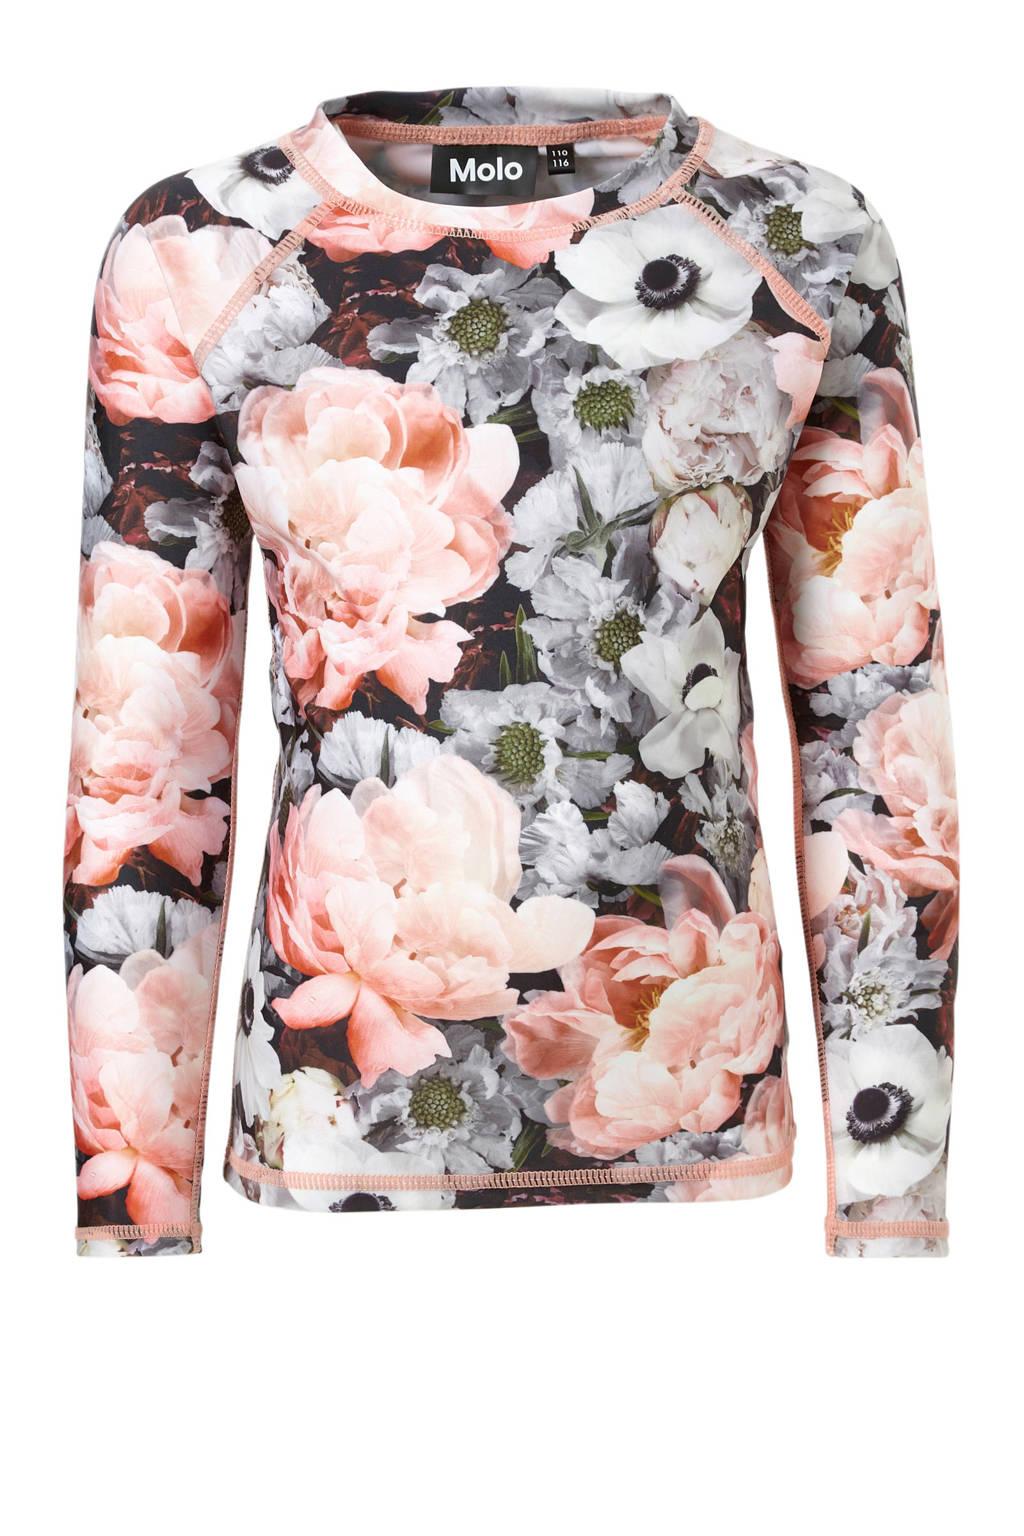 Molo UV T-shirt in all over print roze, Roze/grijs